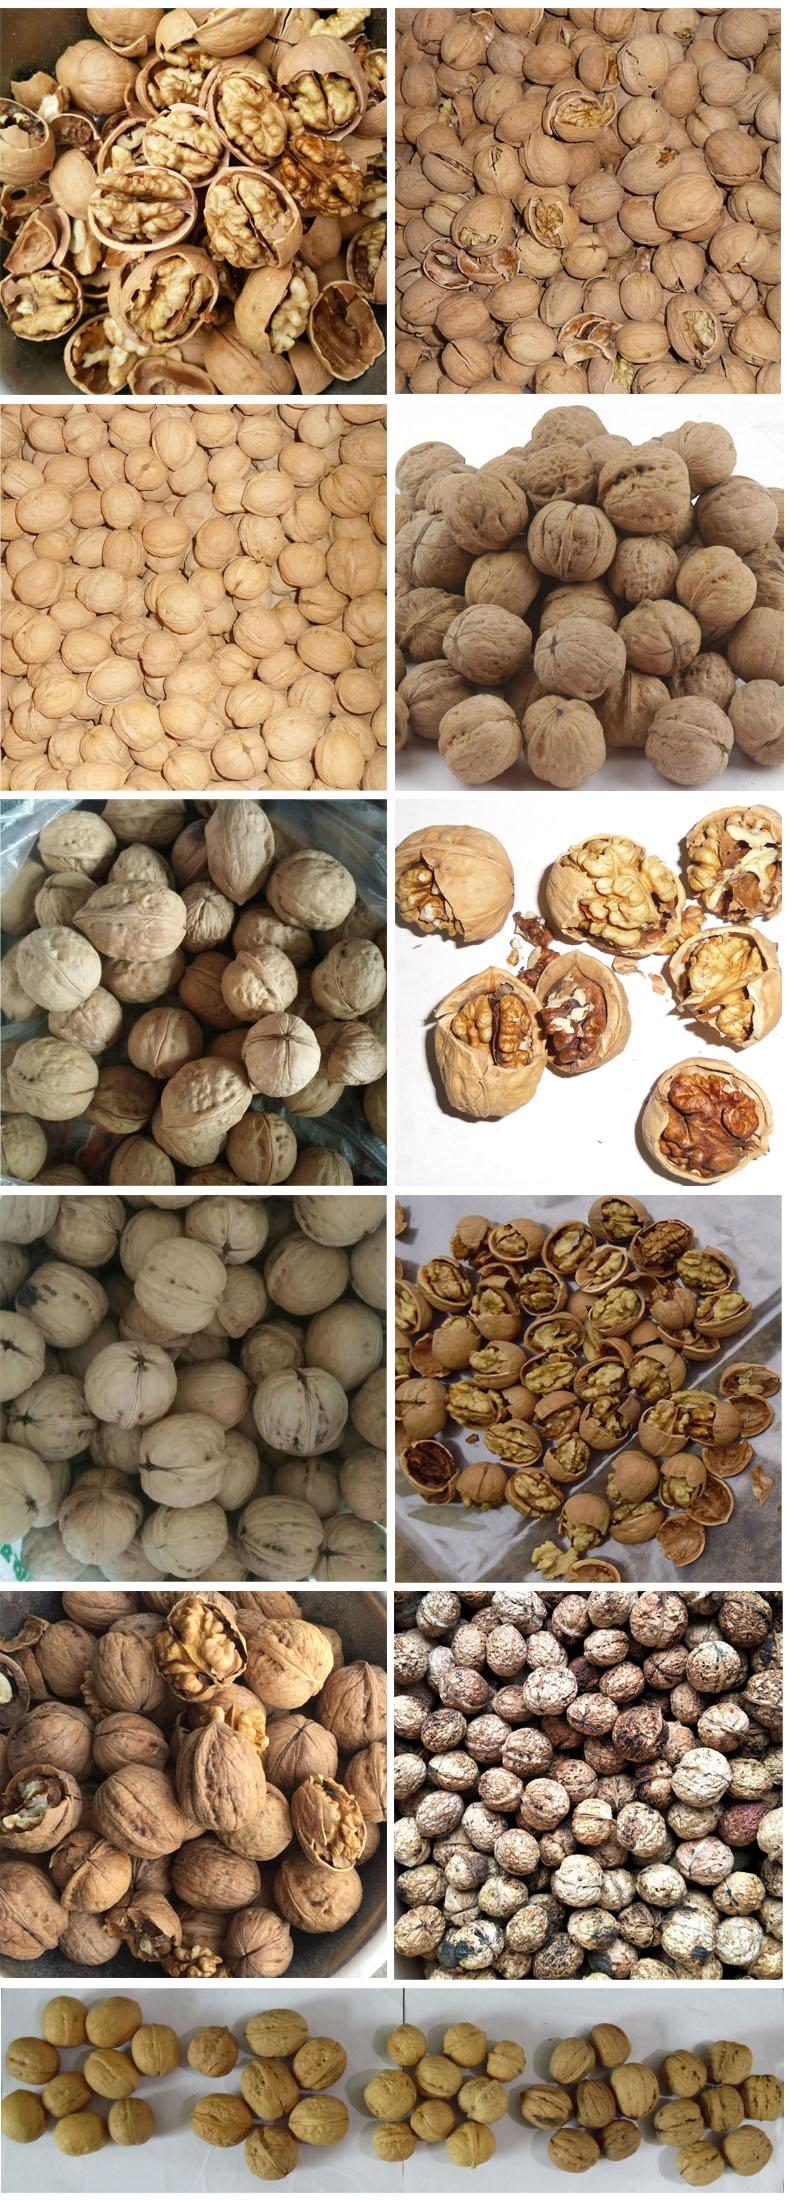 thin shell walnuts